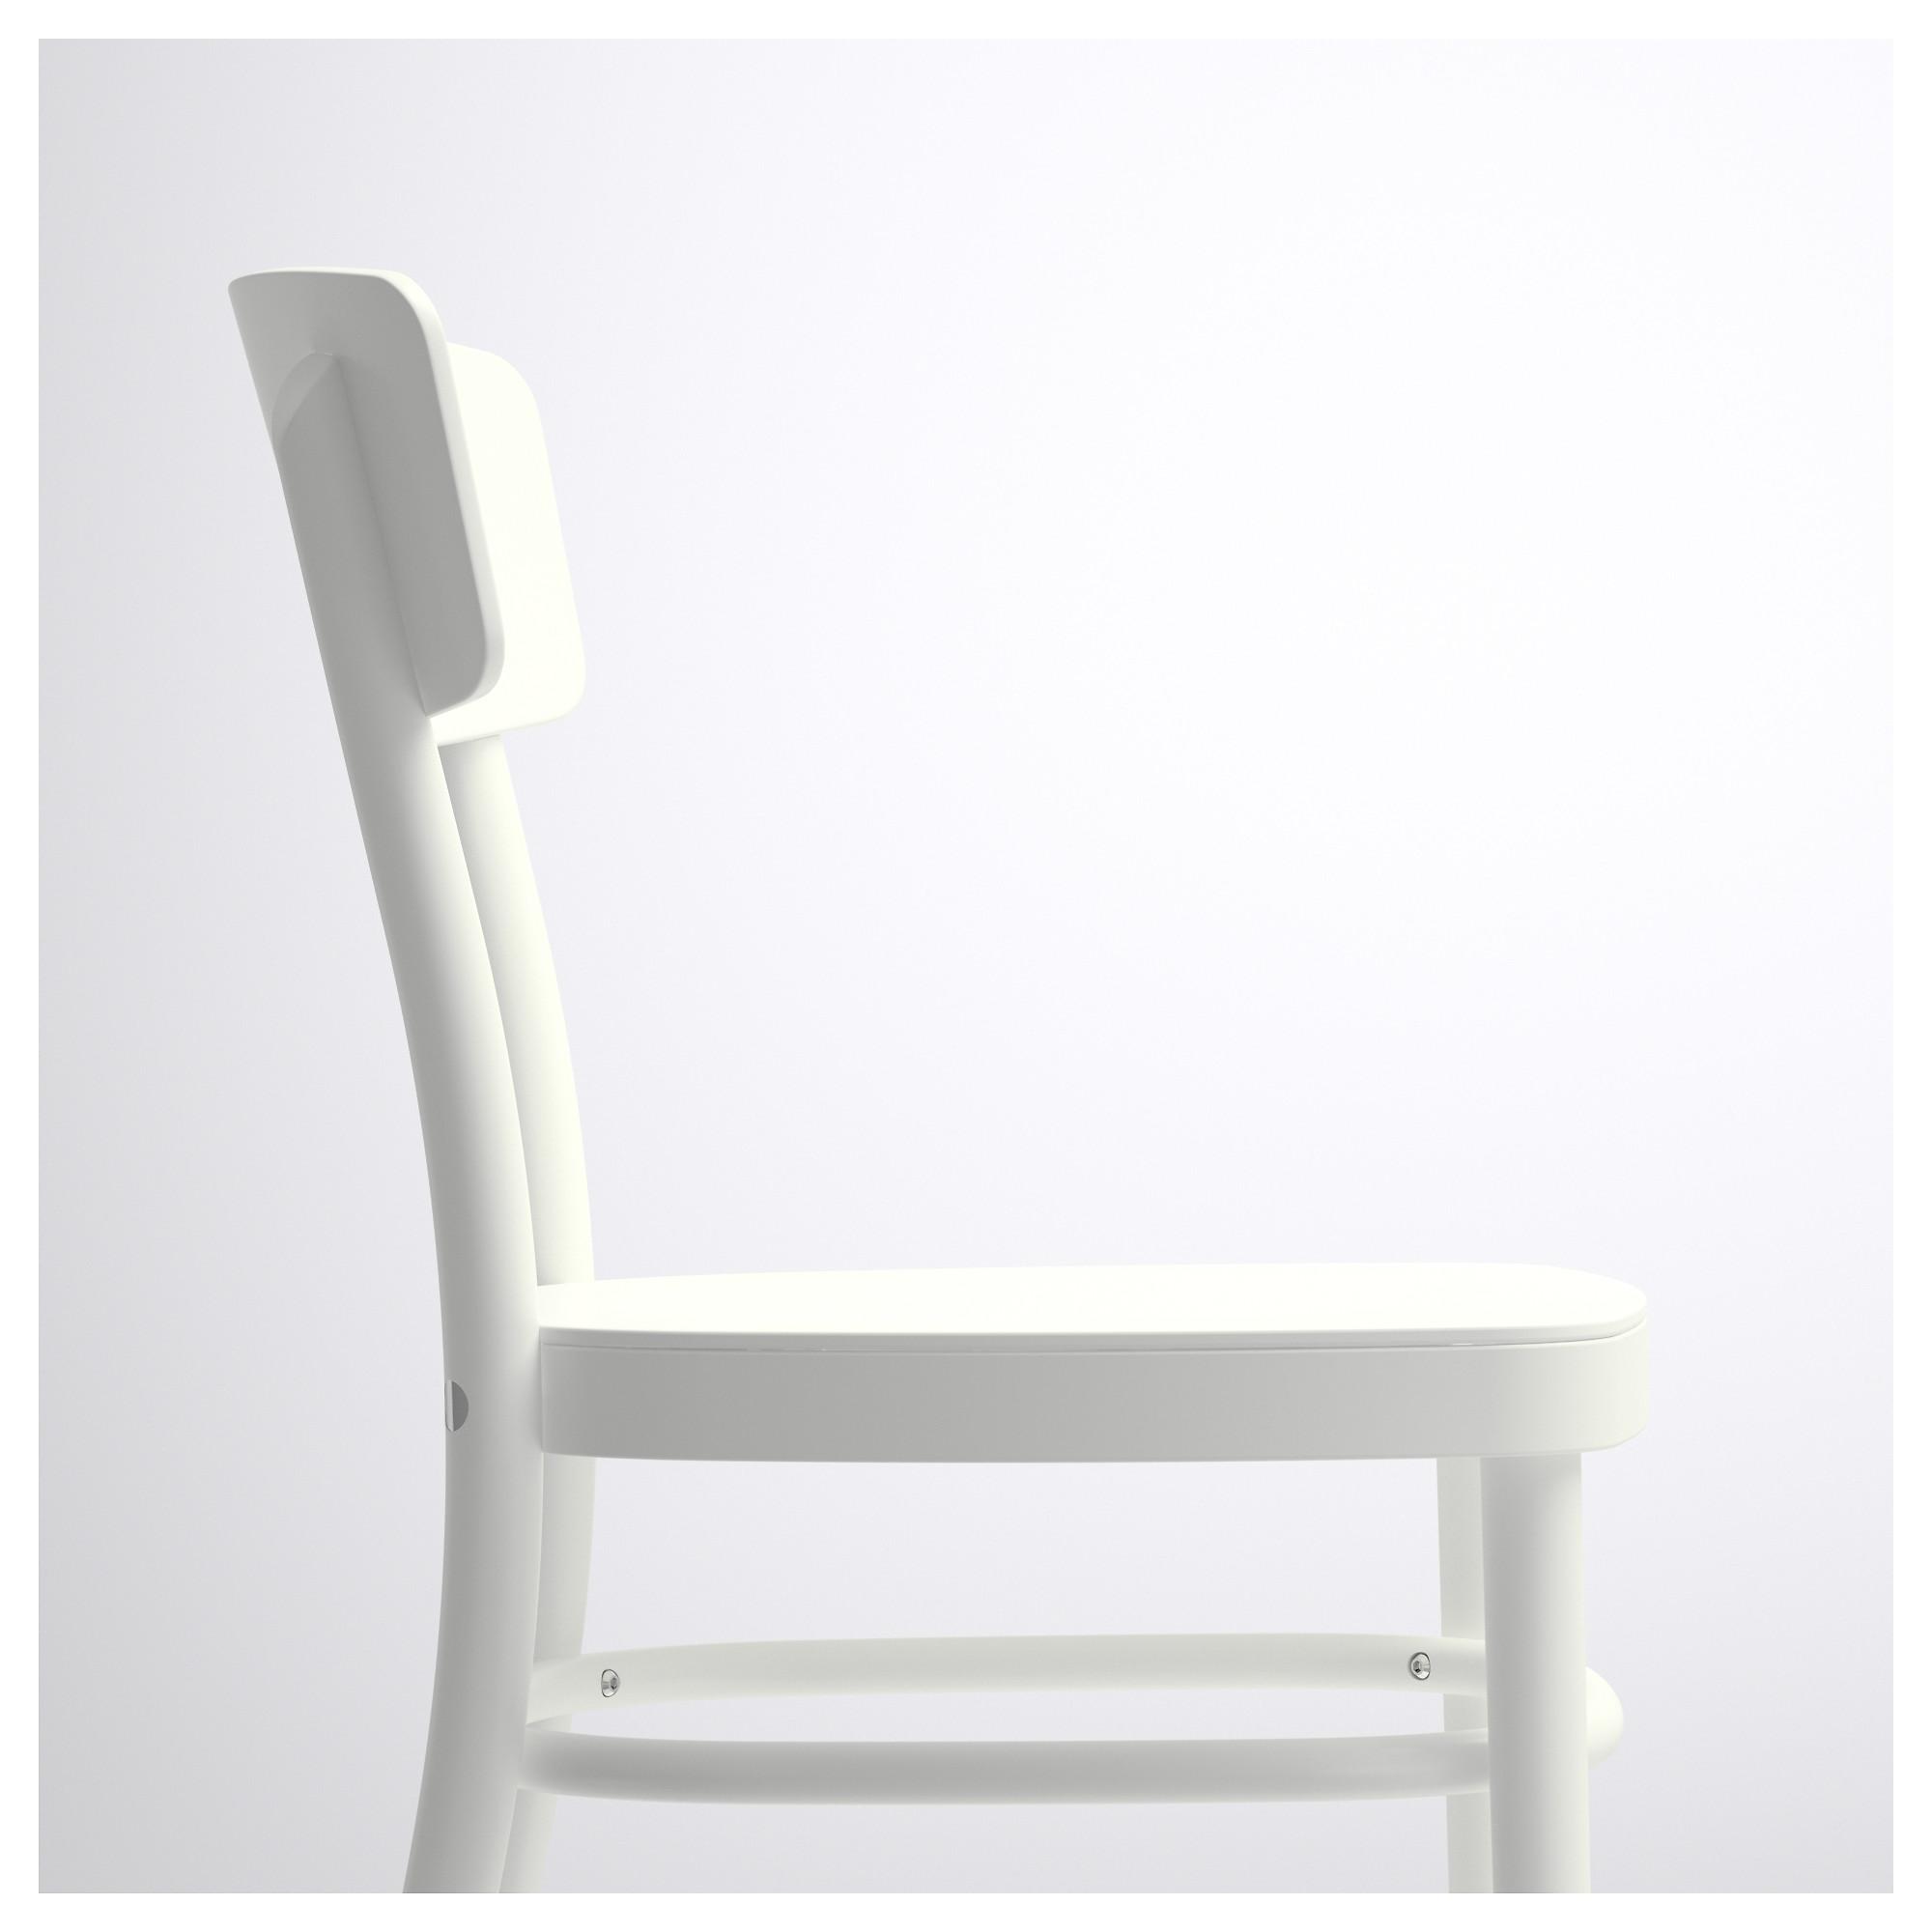 Admirable Idolf Chair White Ikea Hong Kong Inzonedesignstudio Interior Chair Design Inzonedesignstudiocom